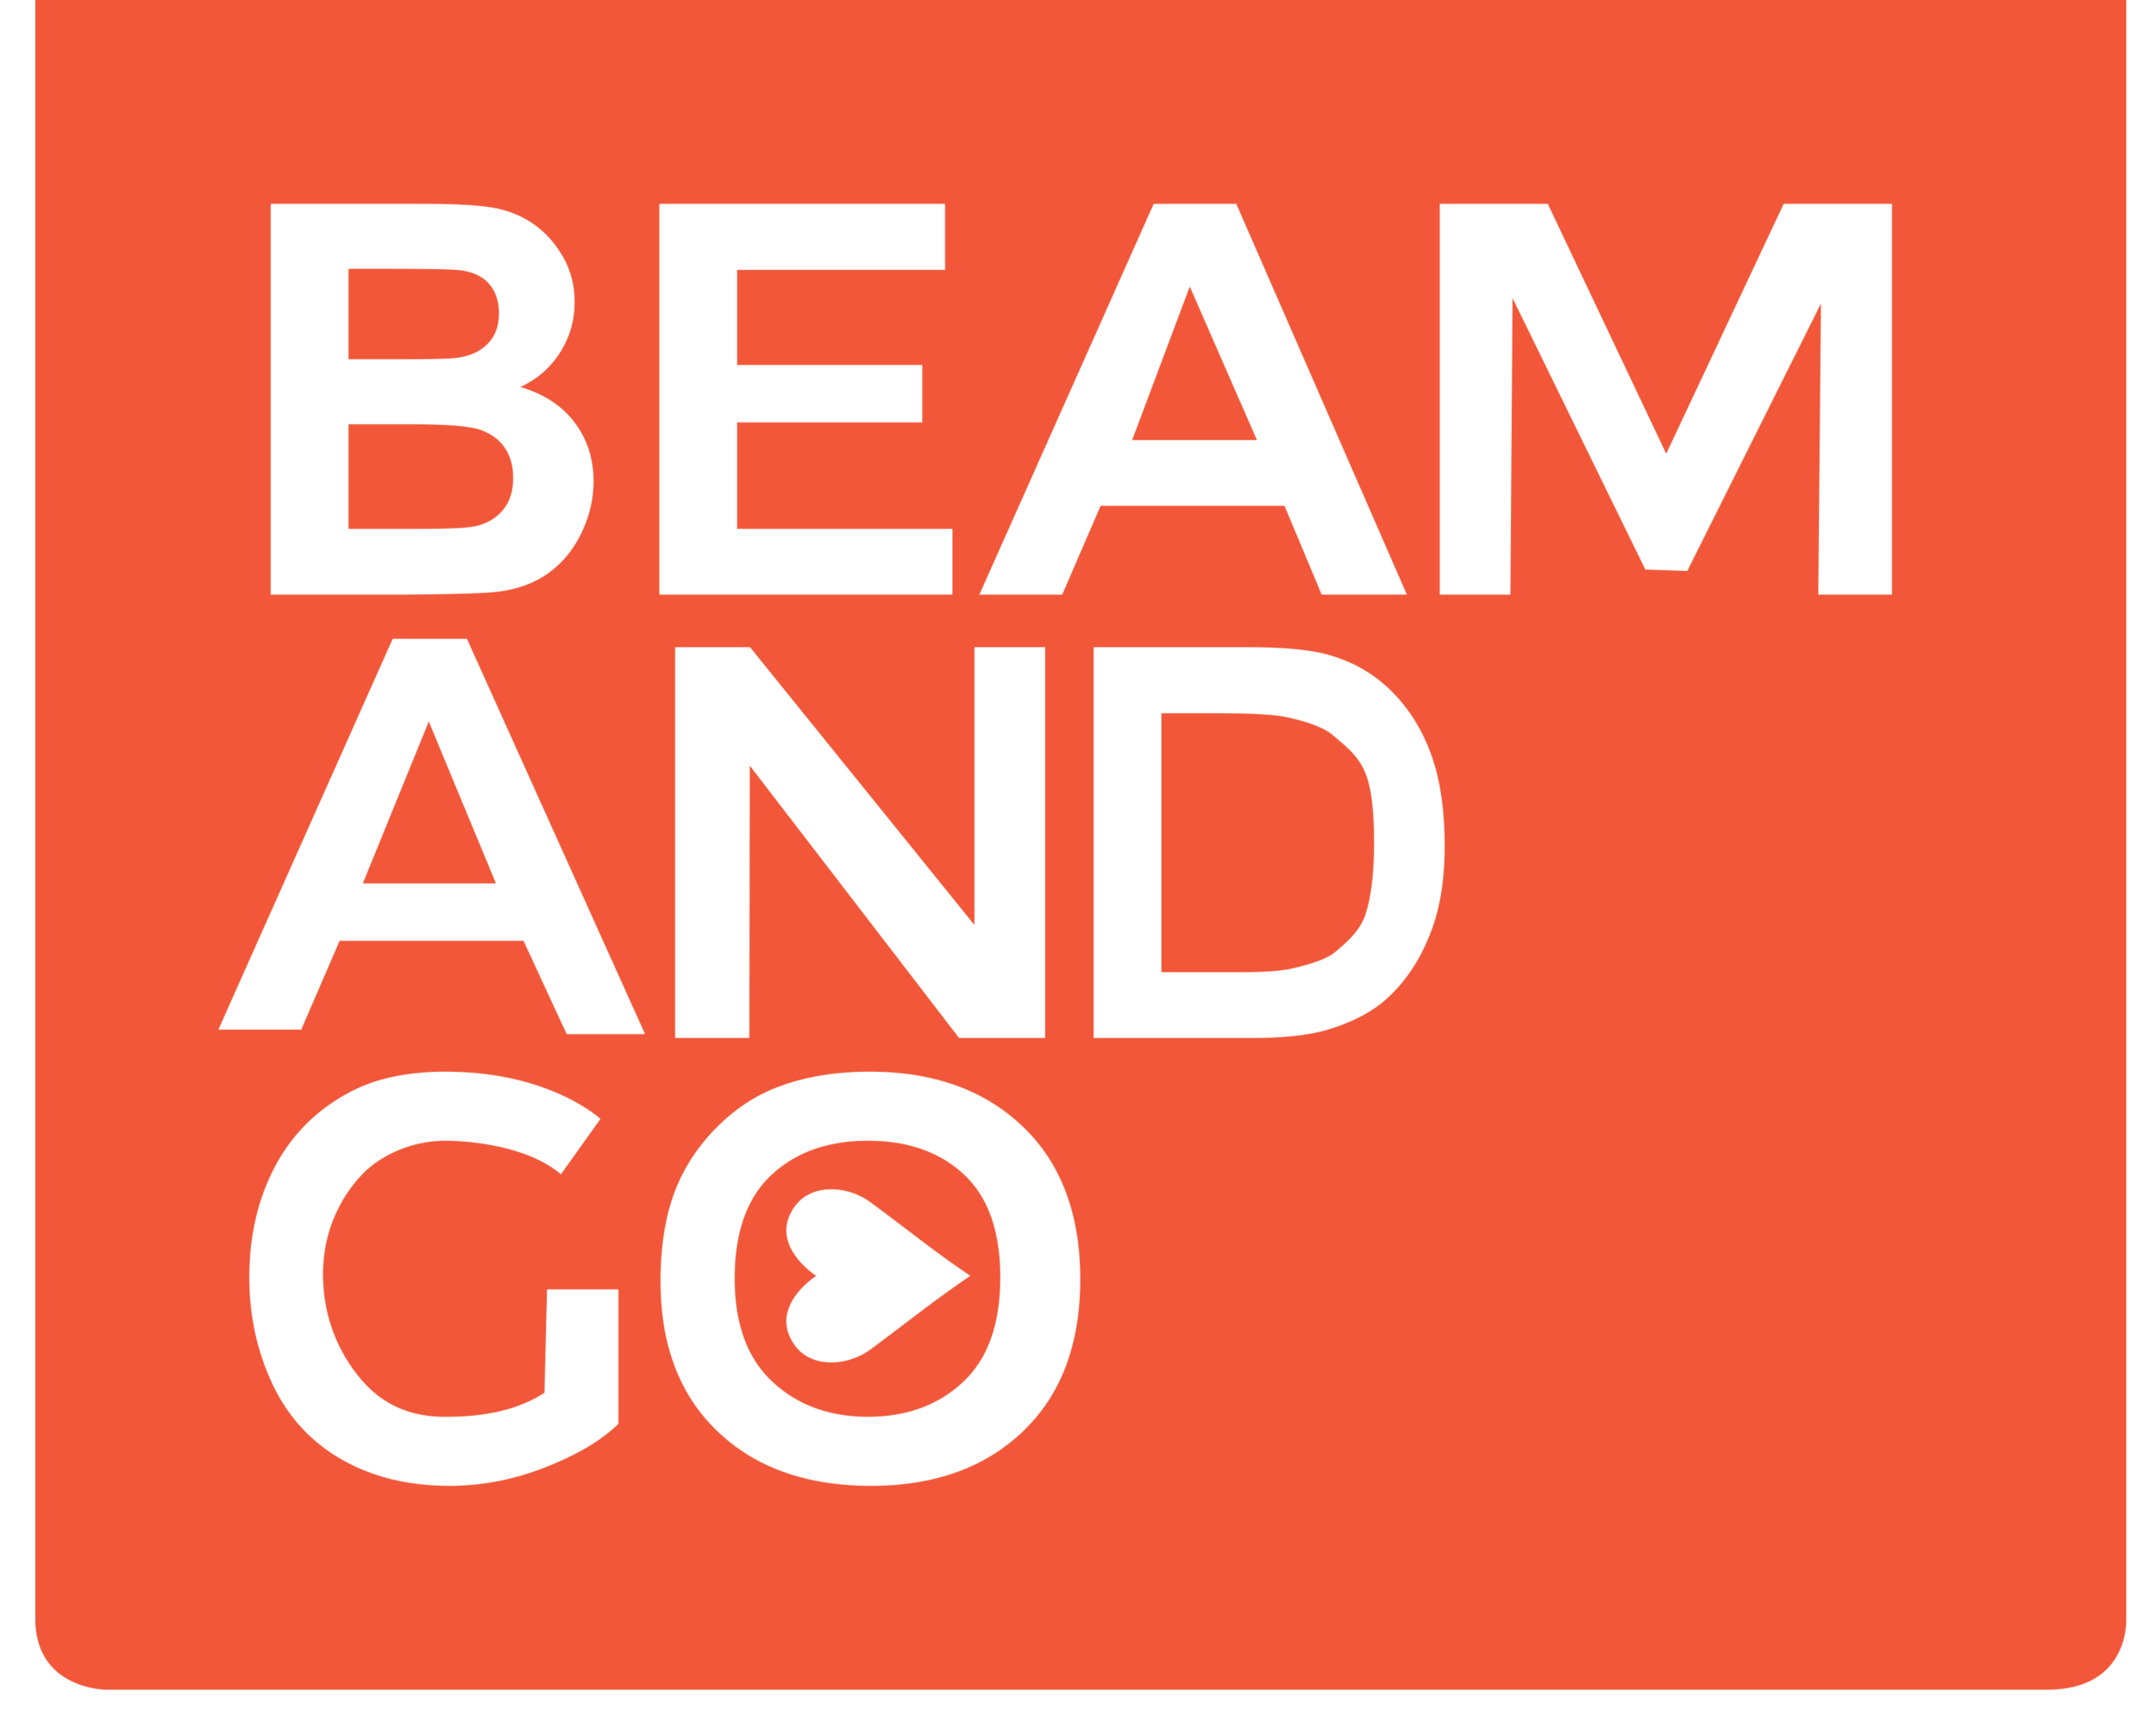 BeamAndGo.png